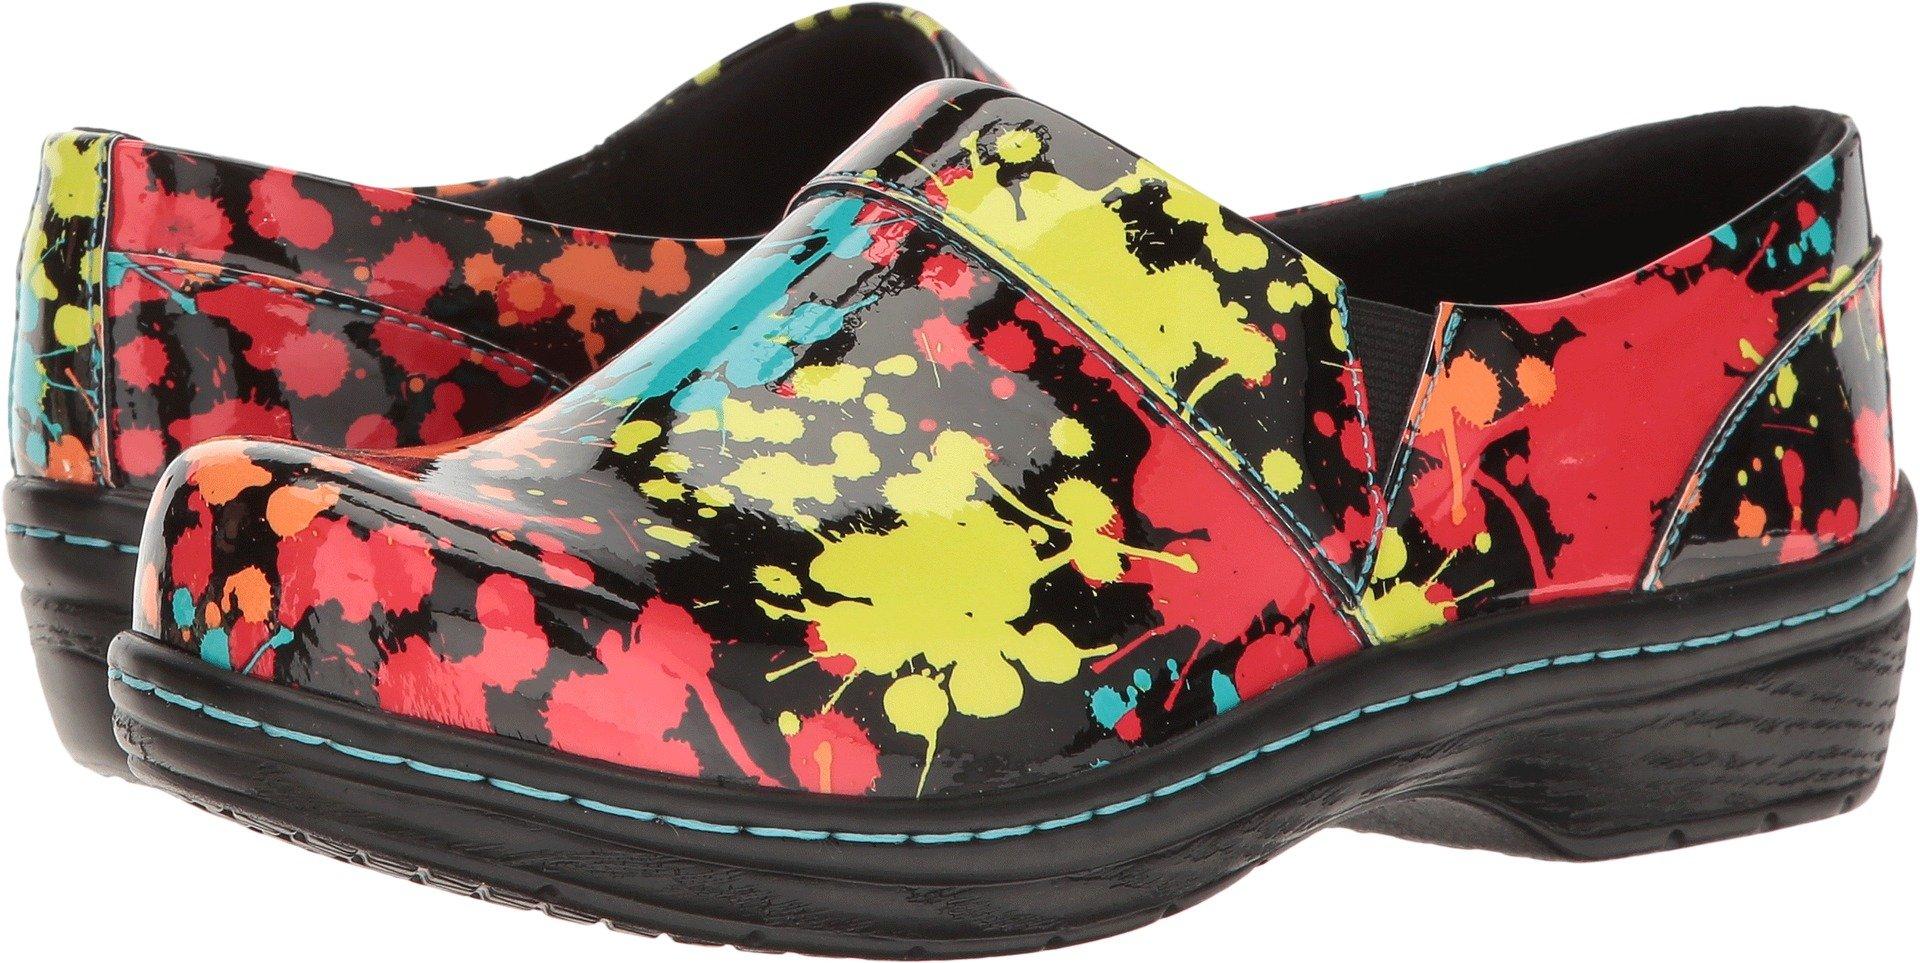 Klogs Footwear Women's Mission Arch Support, Splatter Patent, 7 M US